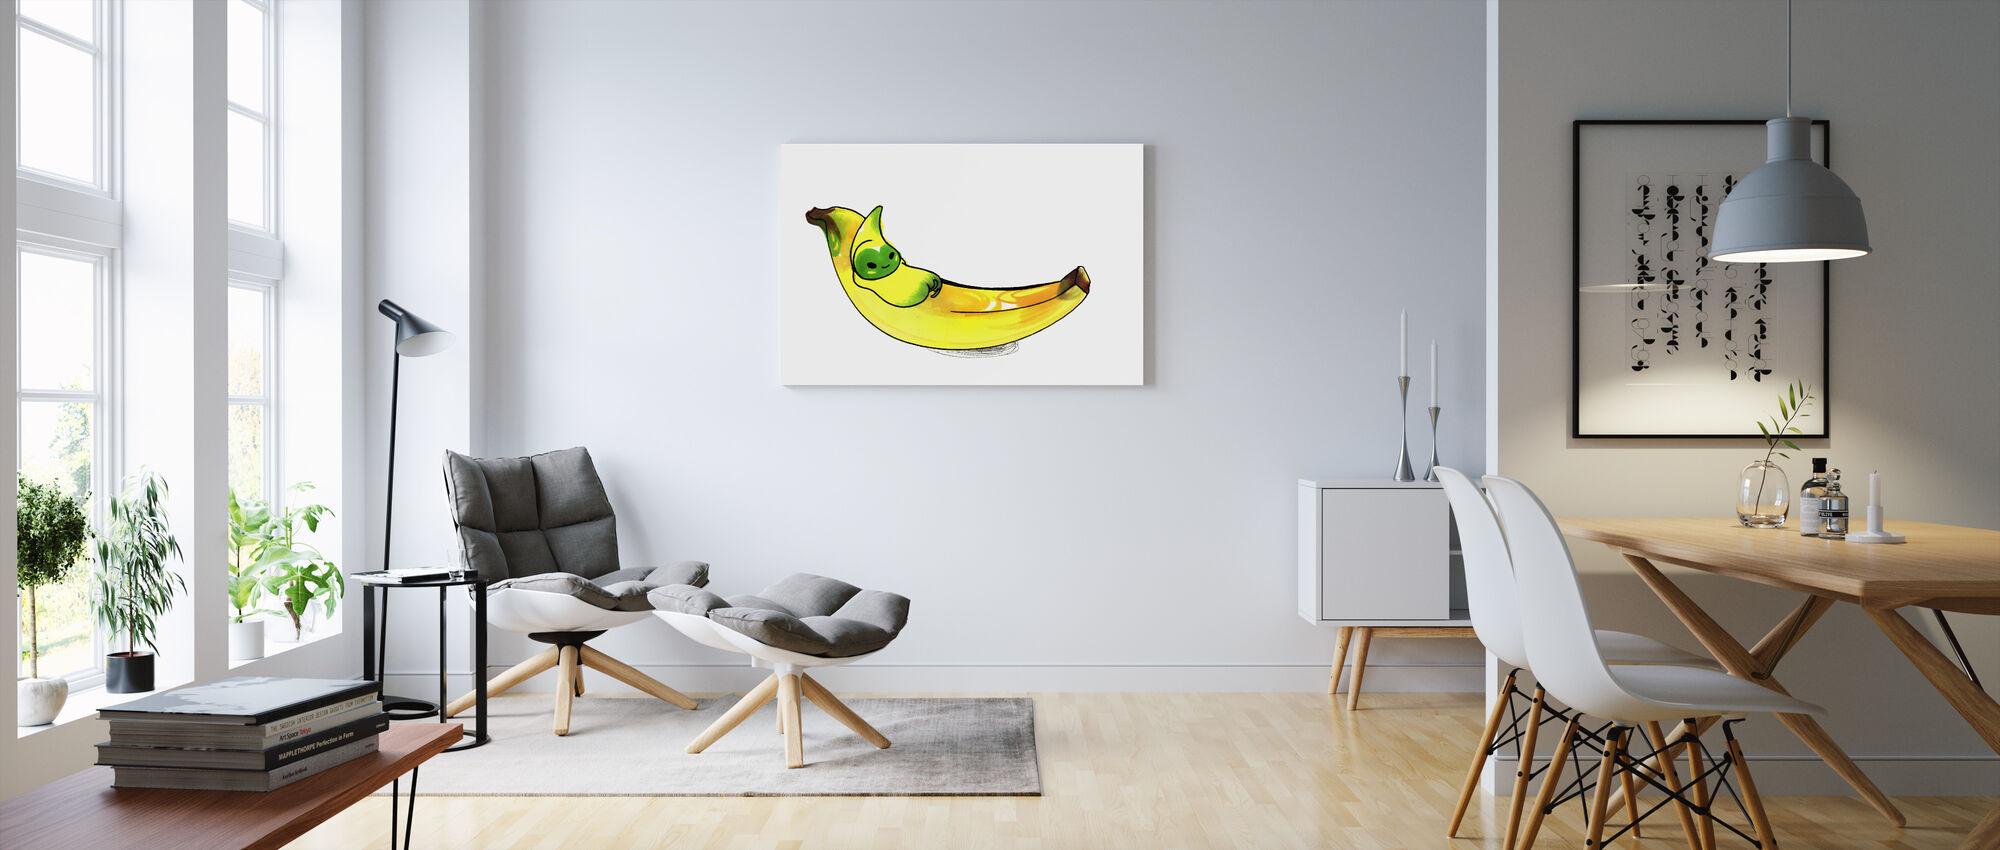 Banana - Canvas print - Living Room